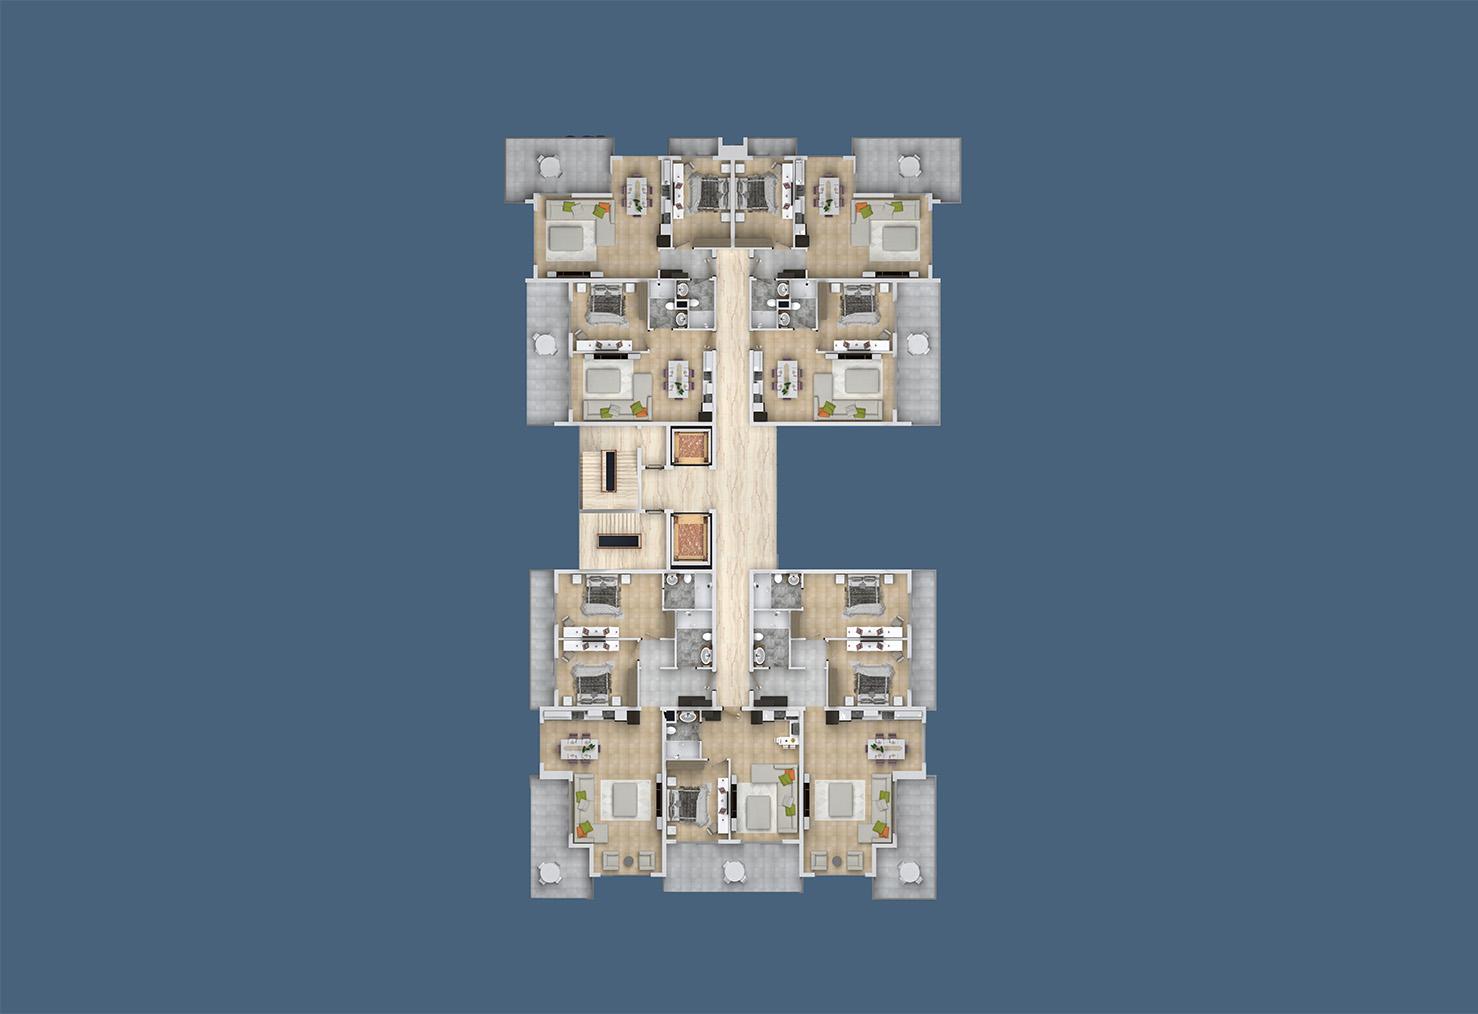 Floor plans of apartments 3 floor «B» Yekta Kingdom Trade Center